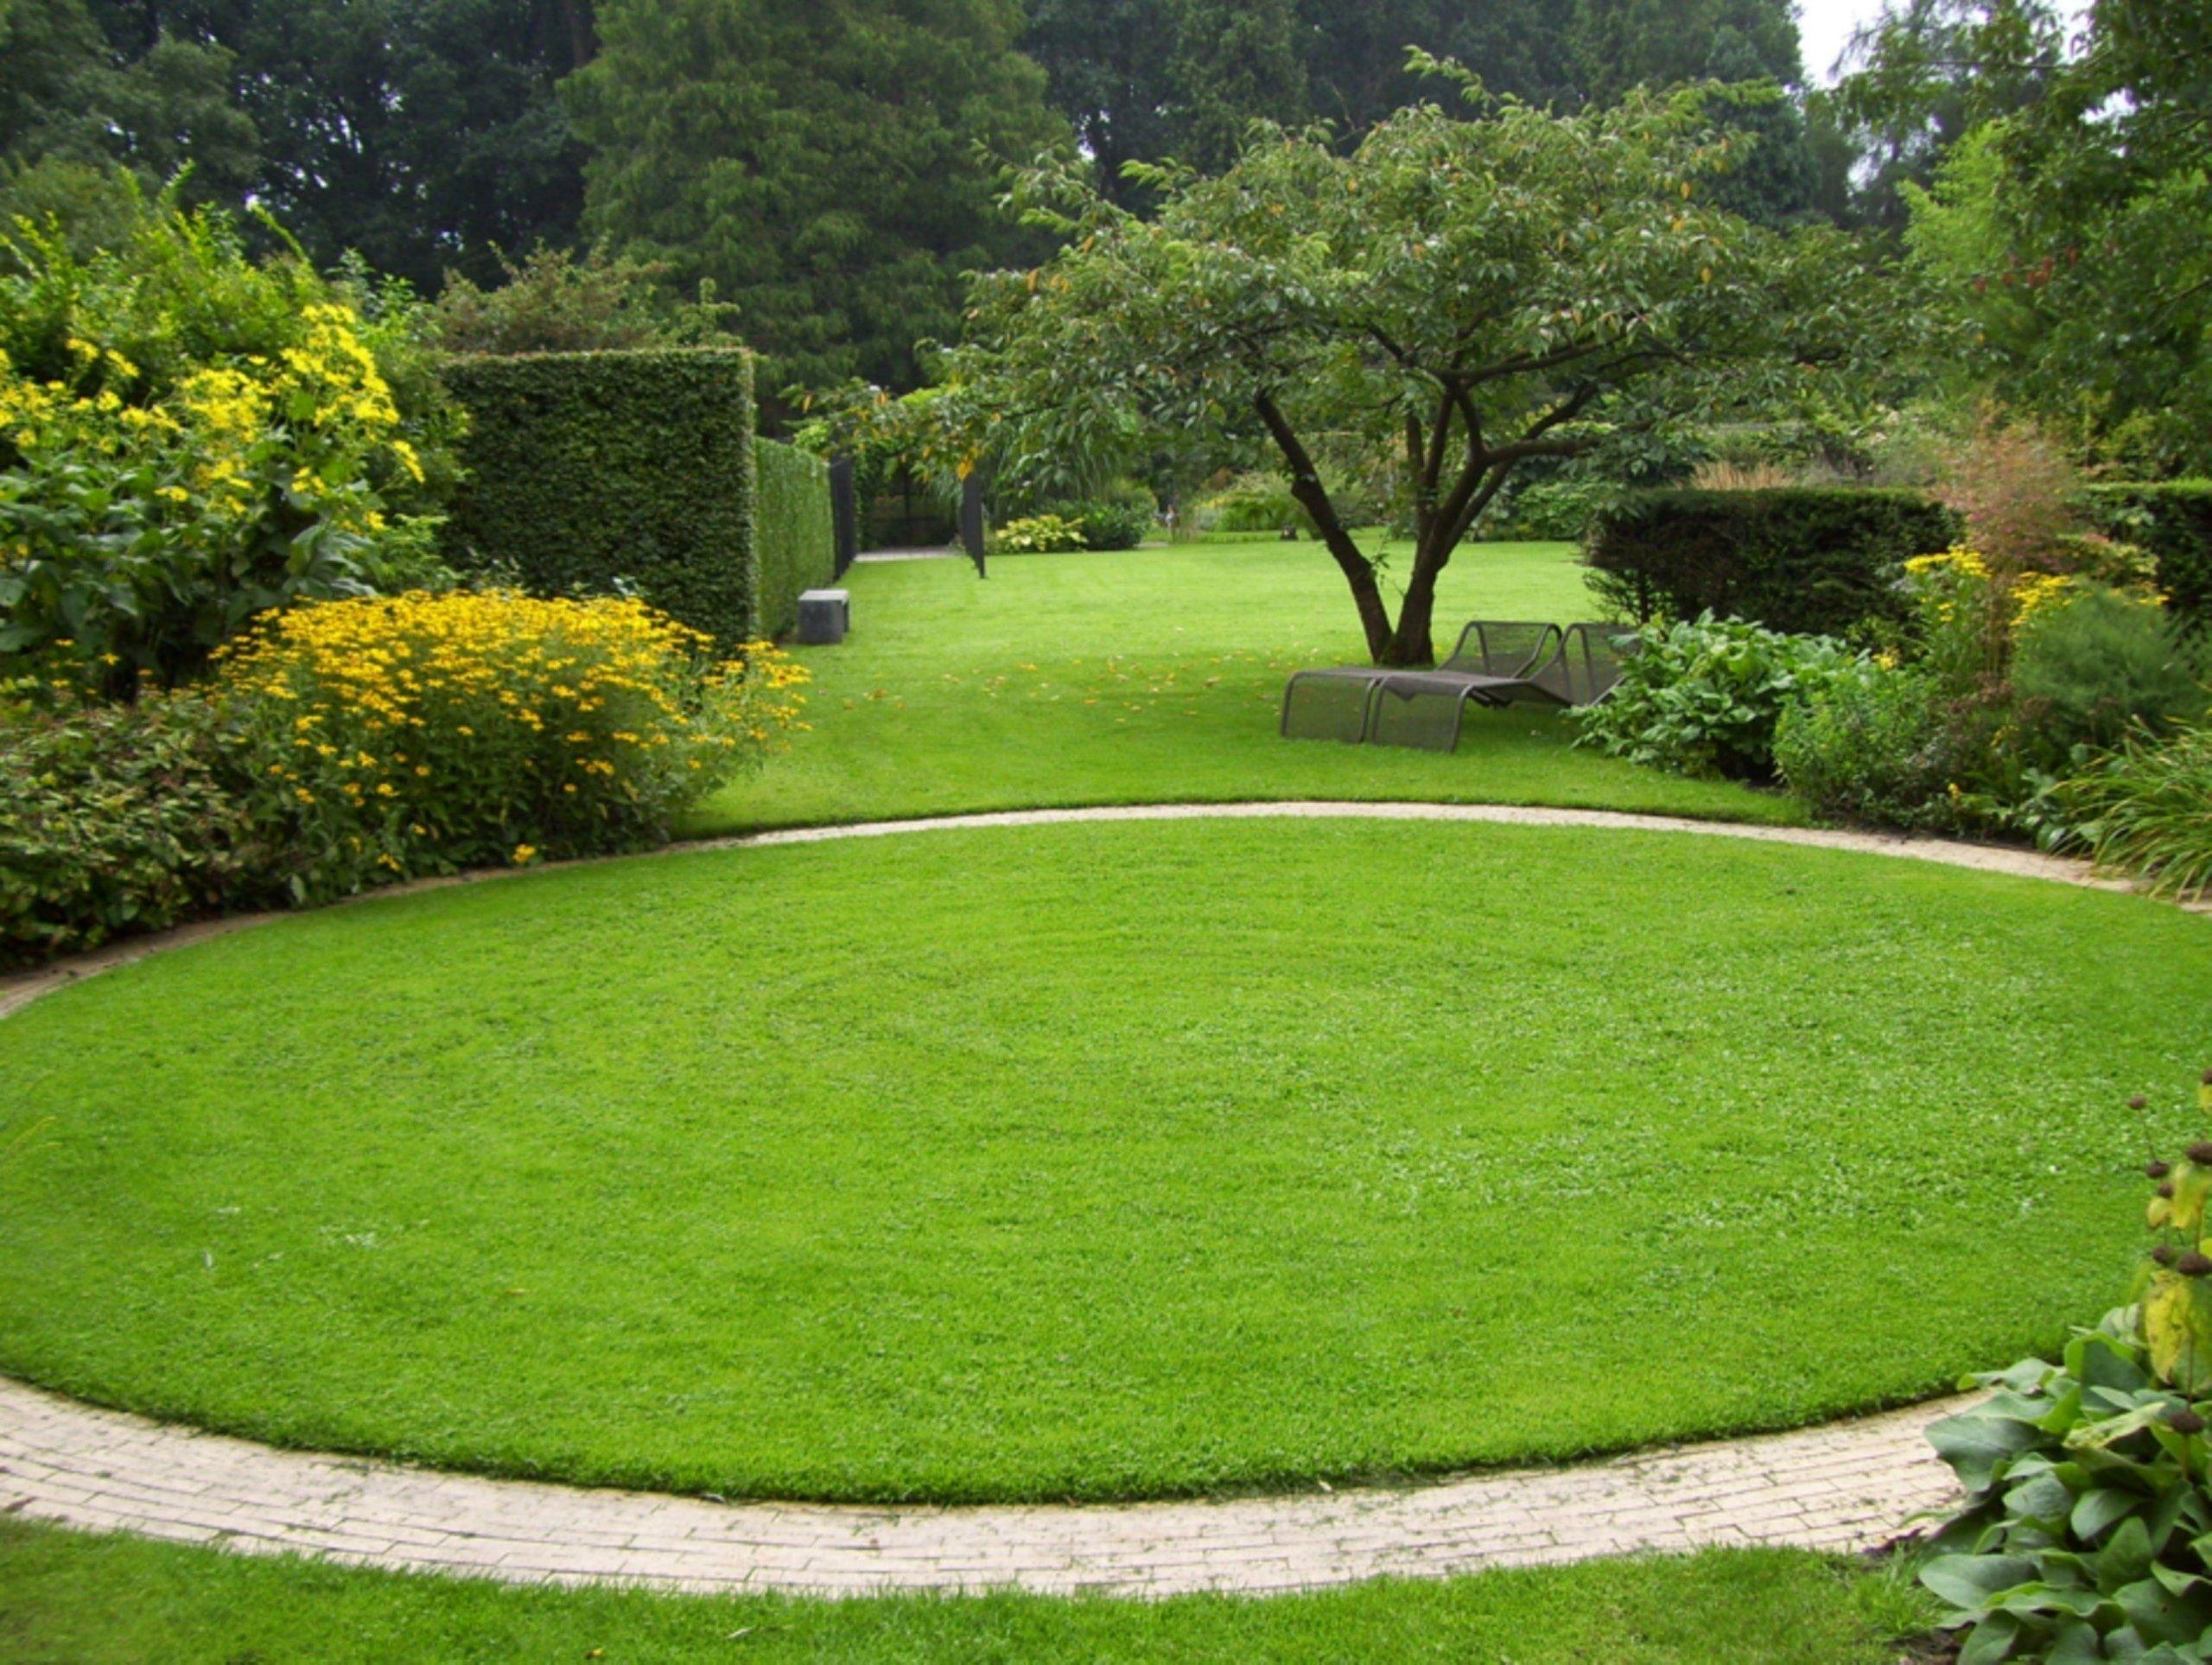 lawn-shape 100+ Surprising Garden Design Ideas You Should Not Miss in 2021